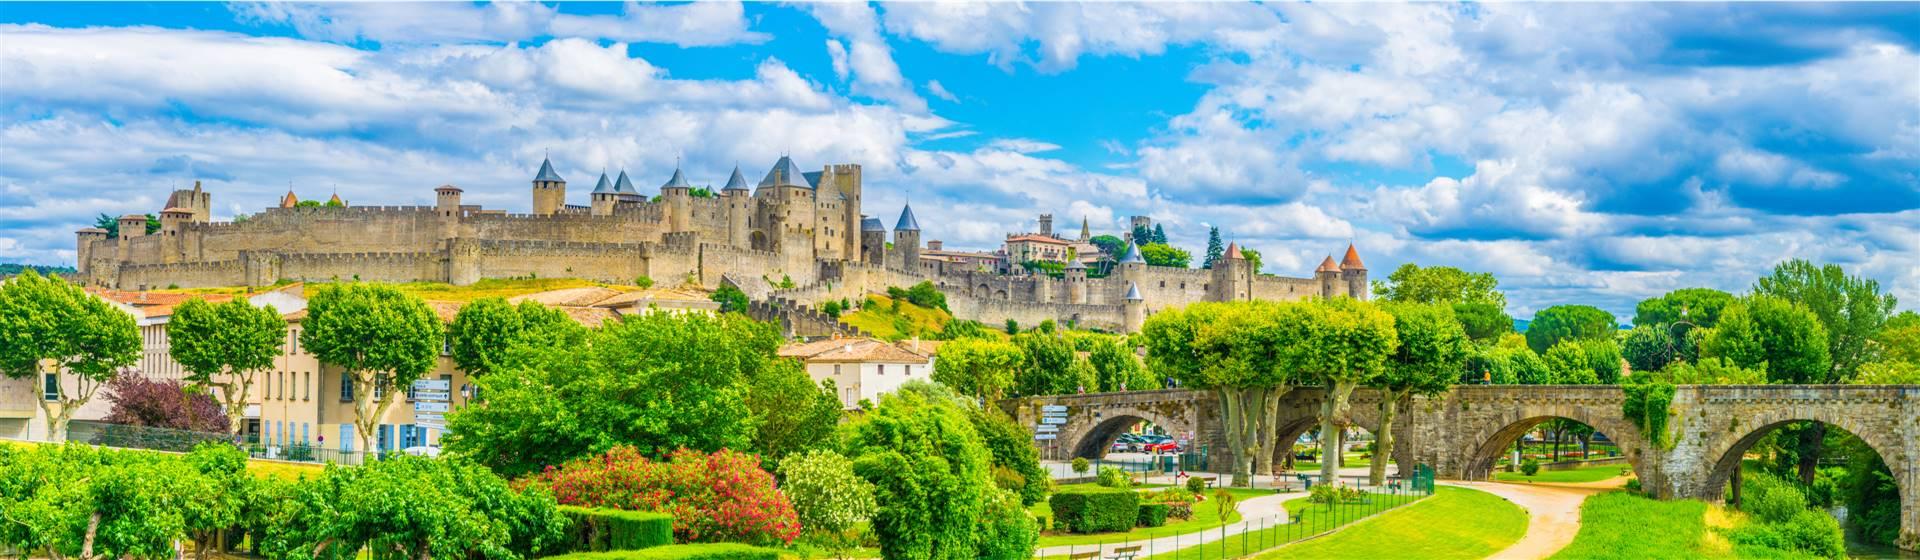 "<img src=""carcassonne-shutterstock_1171833571.jpeg"" alt=""Carcassonne Castle"">"